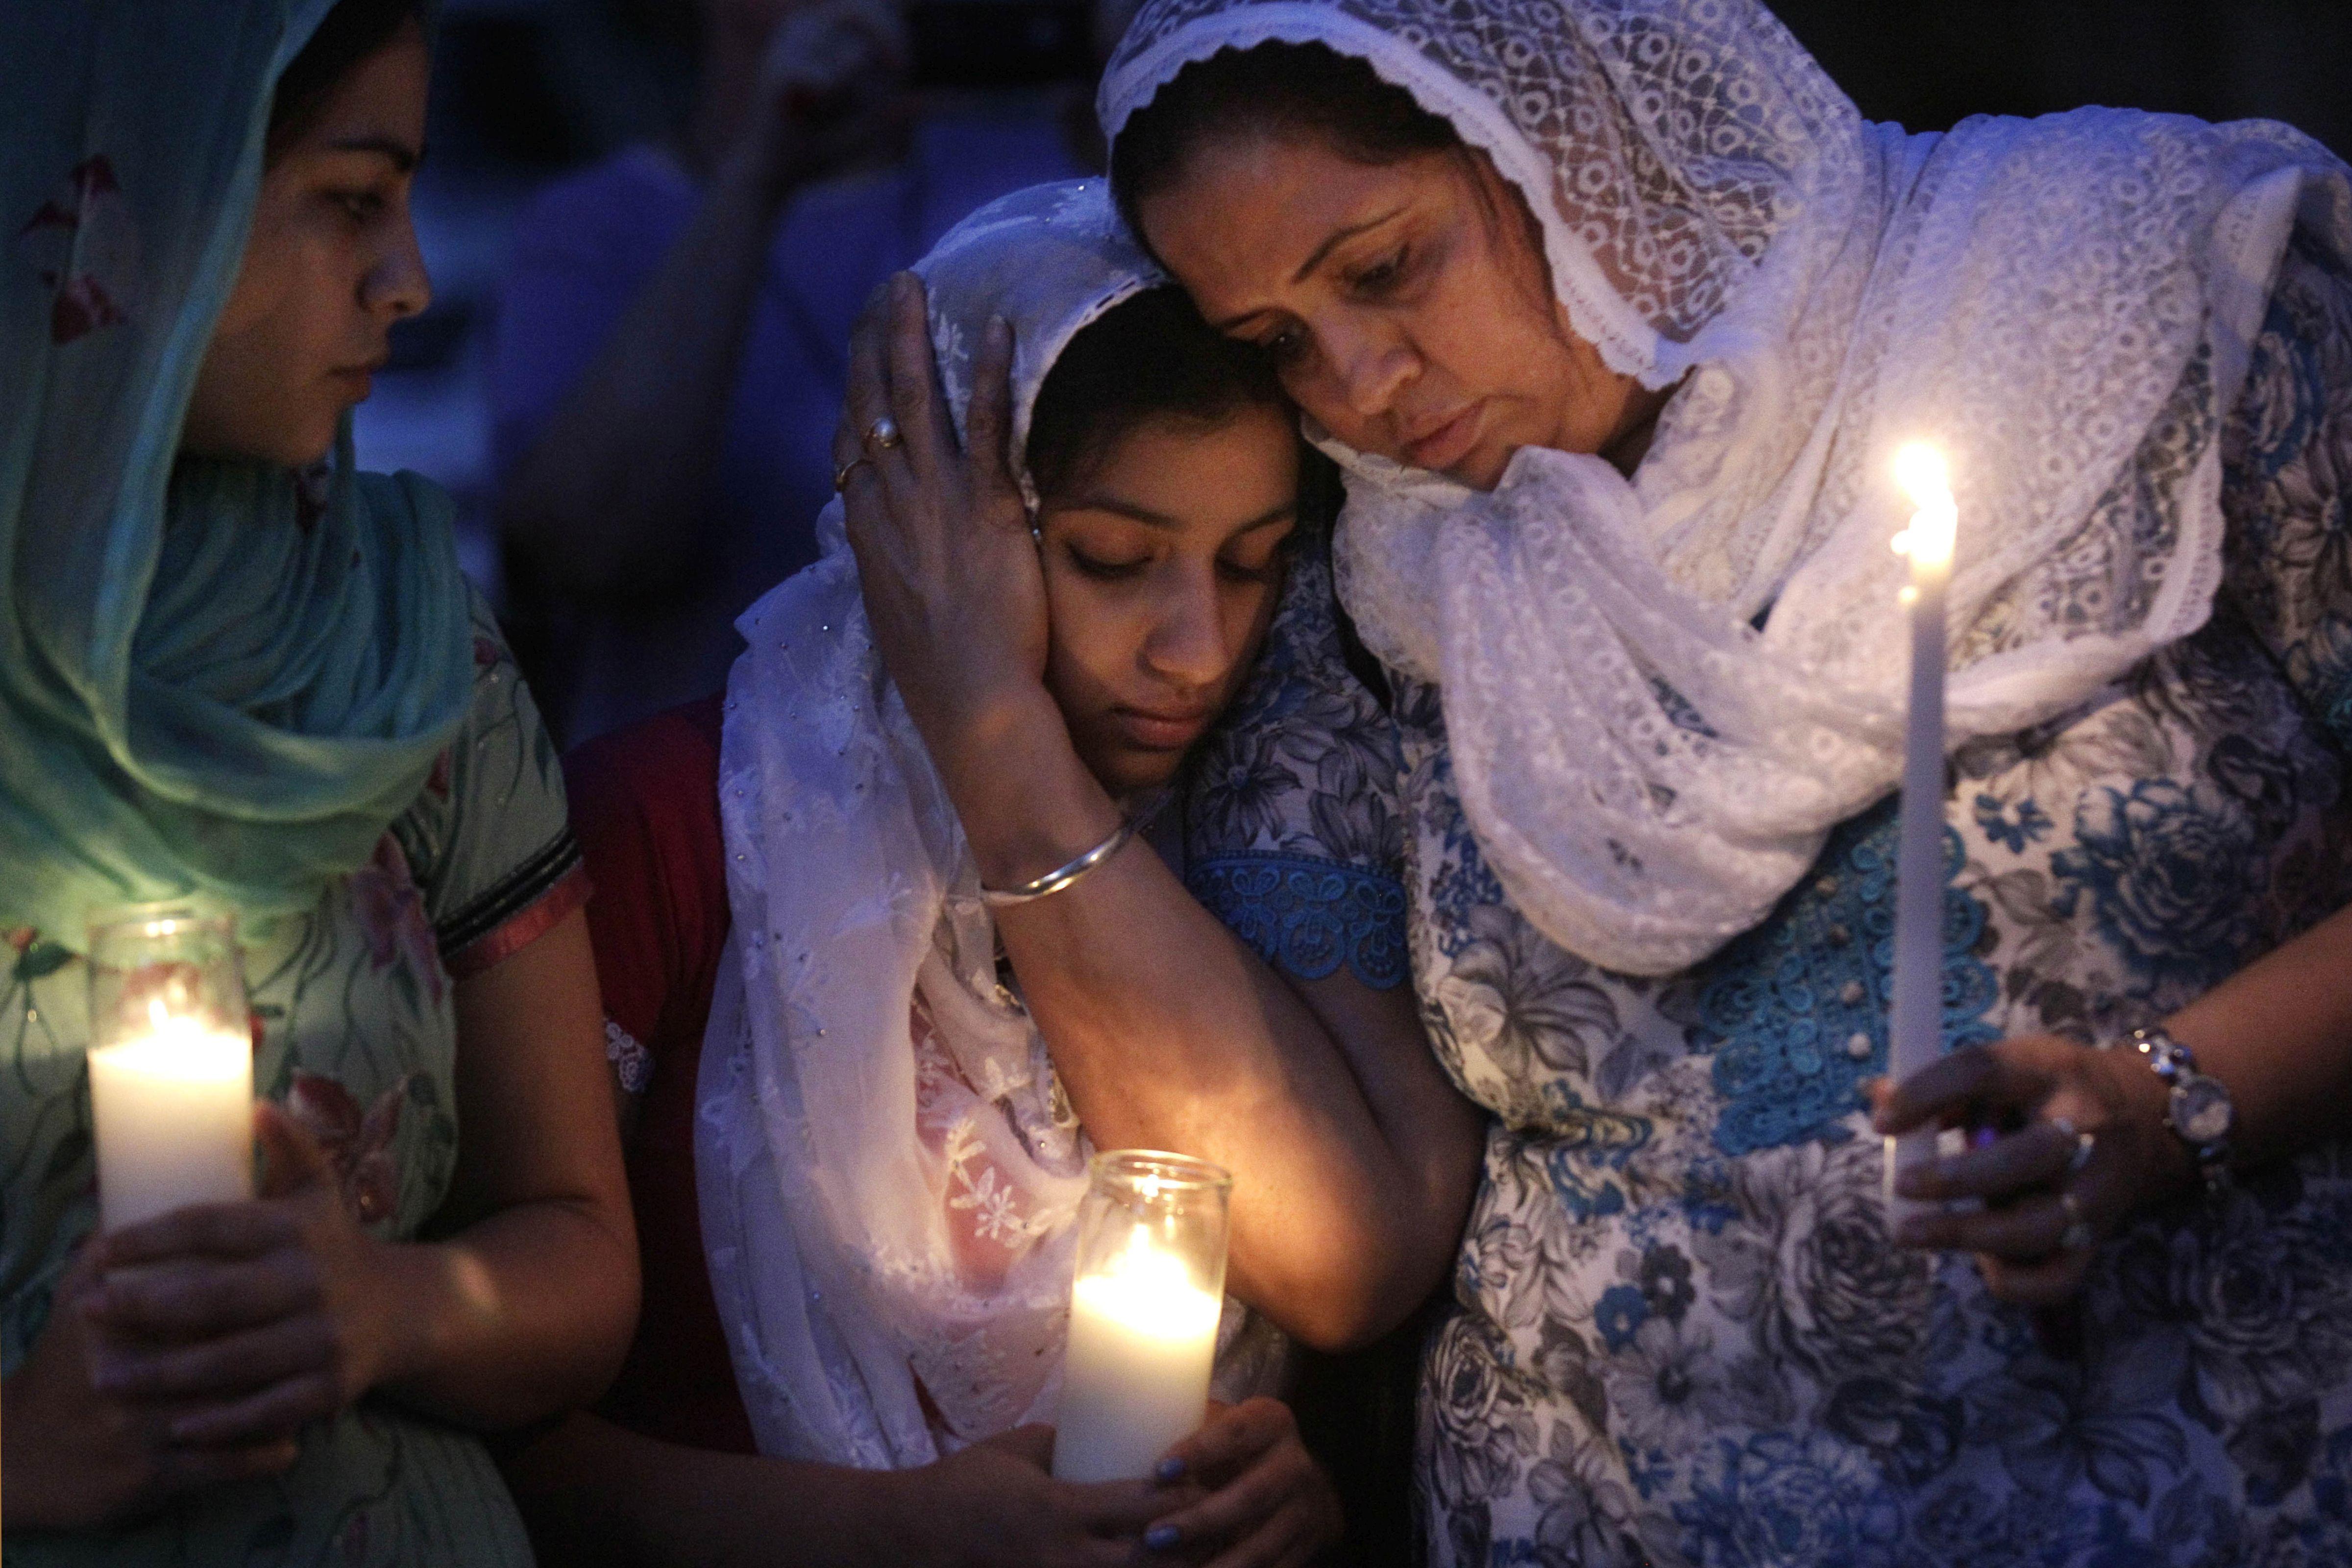 Photo: 2012 Sikh Temple Shooting | Prayer Vigil - AP